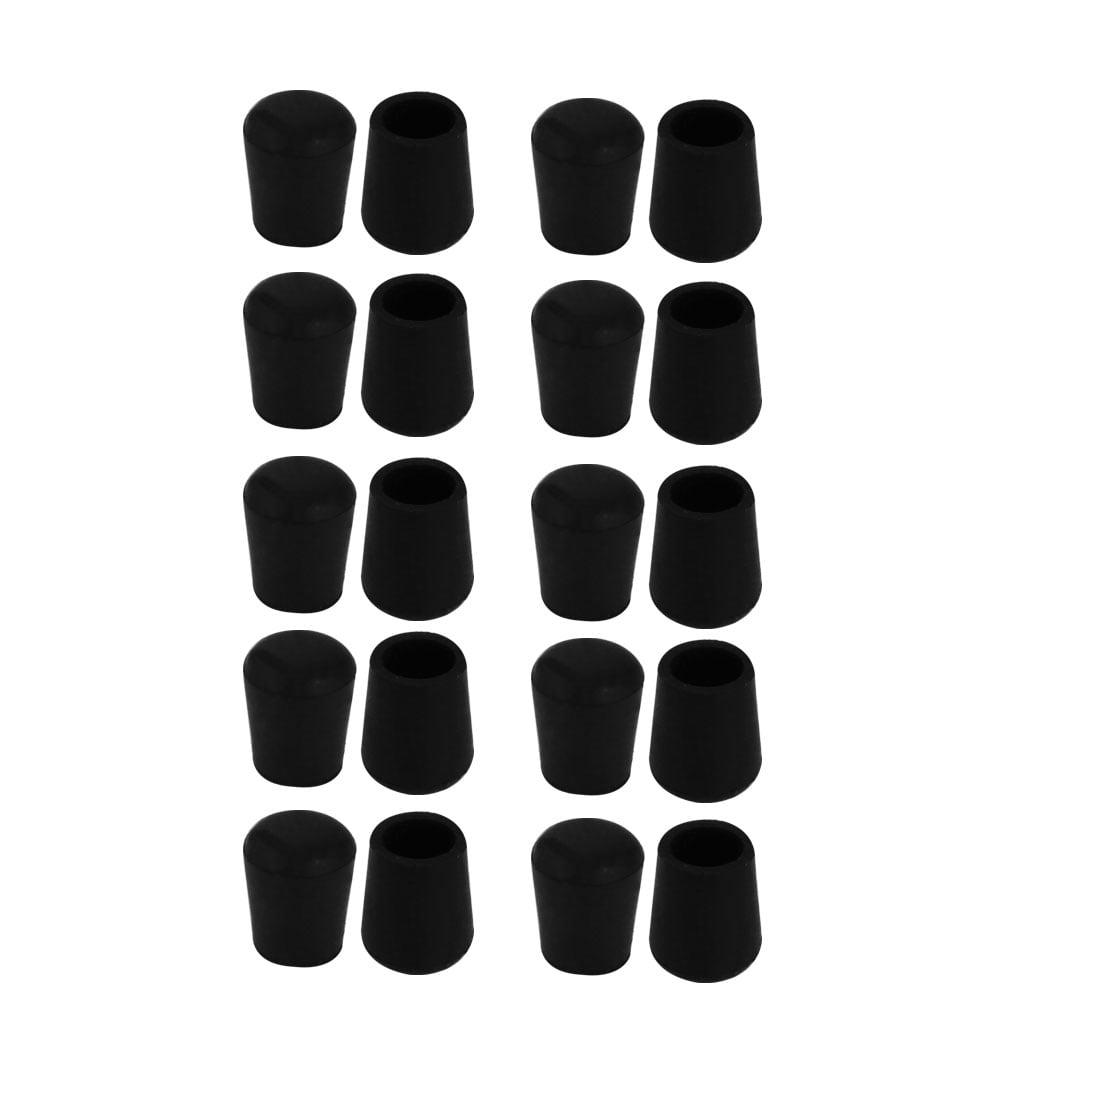 20pcs Chair Leg Caps Rubber Floor Protector Furniture Feet Covers 10mm Inner Dia